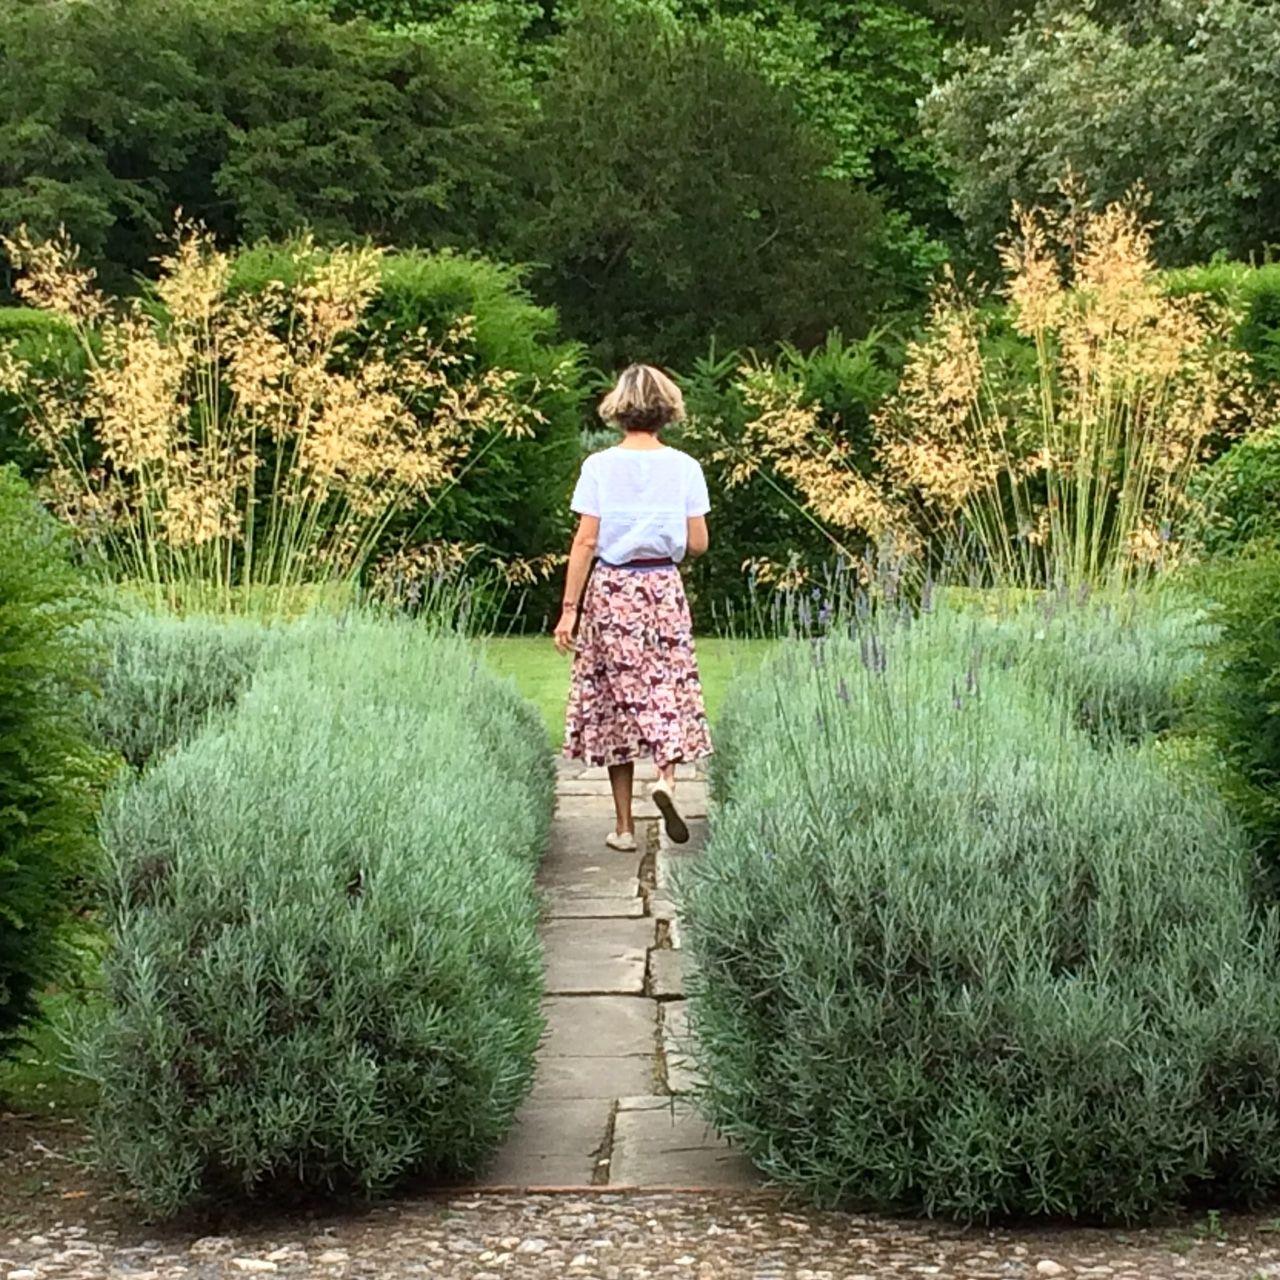 10 Plants For Courtyard Gardens Design | Interior Design Ideas on